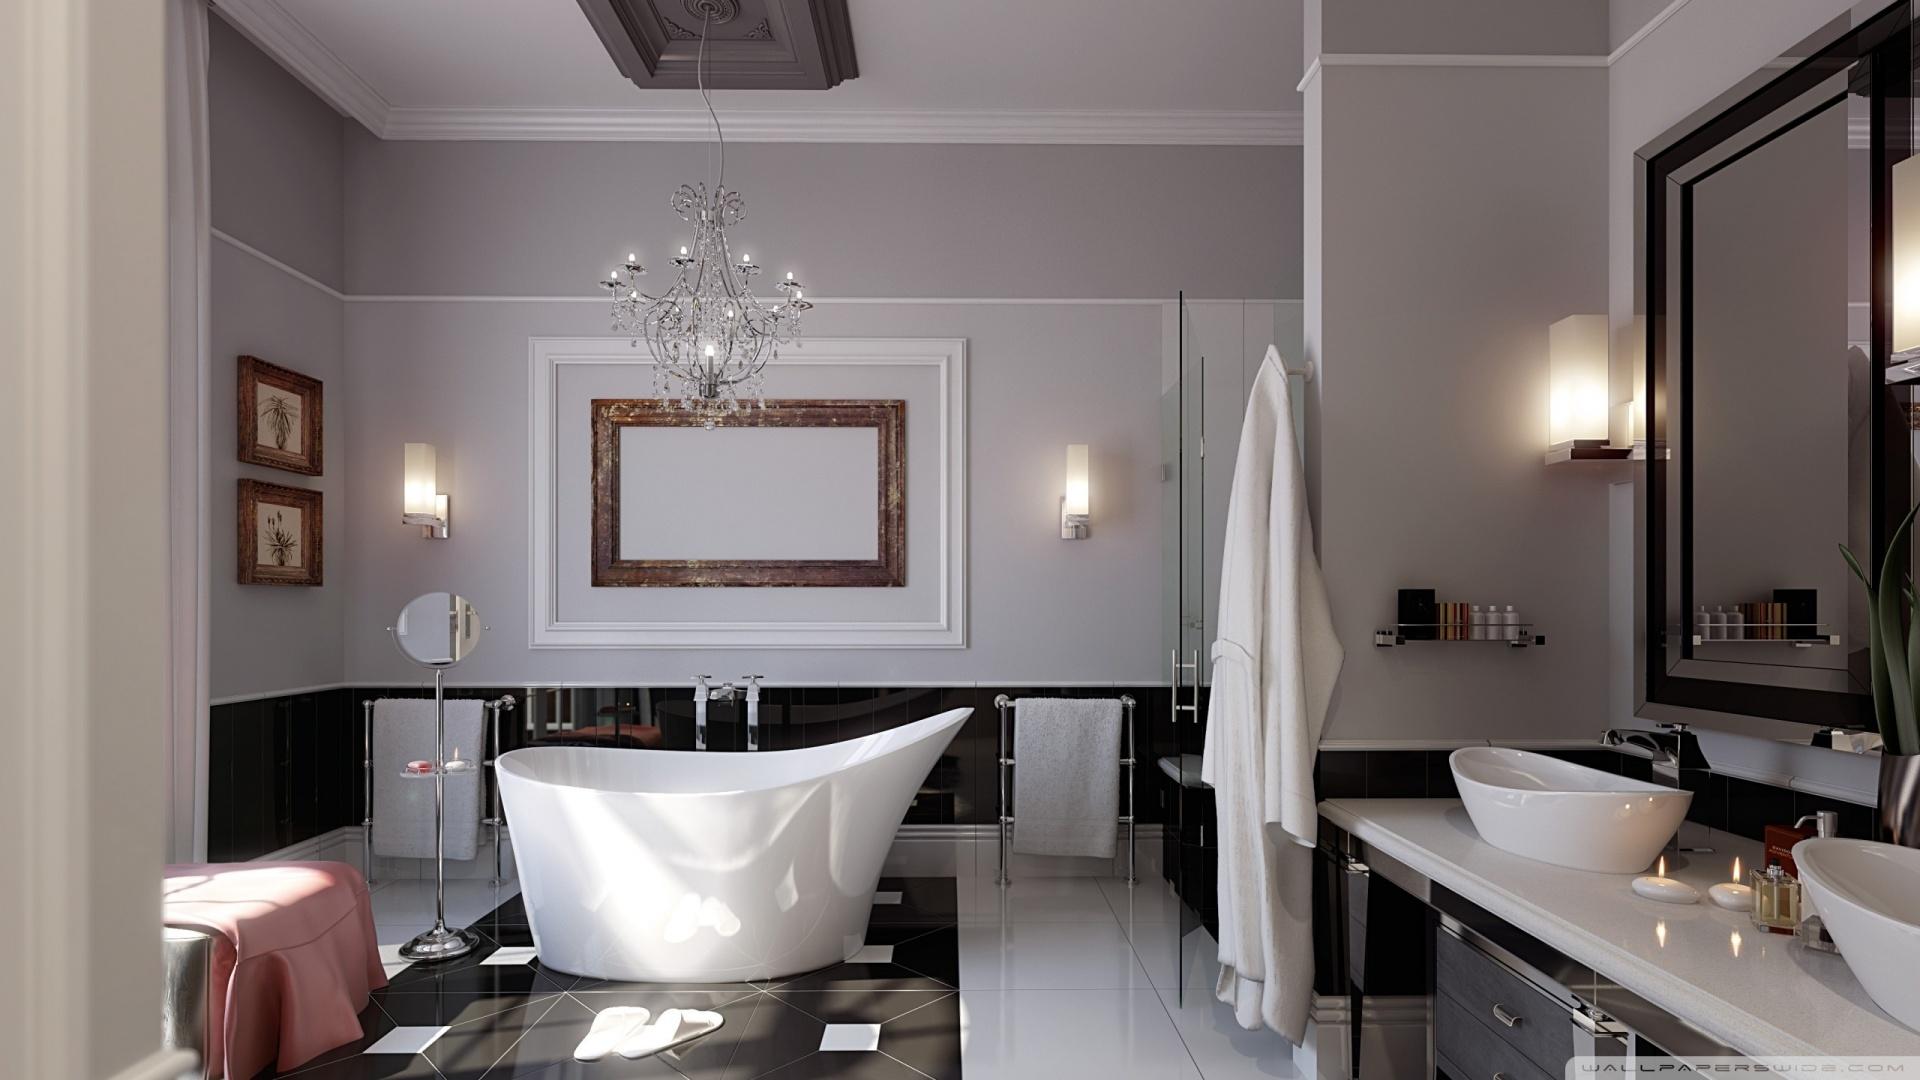 Victorian Bathroom Design Ideas | Bella Bathrooms on school bathroom tile, nature bathroom tile, masculine paint, single bathroom tile, natural bathroom tile, common bathroom tile, light bathroom tile, geometric bathroom tile, contemporary bathroom tile, smooth bathroom tile, floral bathroom tile, classy bathroom tile, home bathroom tile, sexy bathroom tile, earthy bathroom tile, masculine kitchen, male bathroom tile, women bathroom tile, straight bathroom tile, funny bathroom tile,